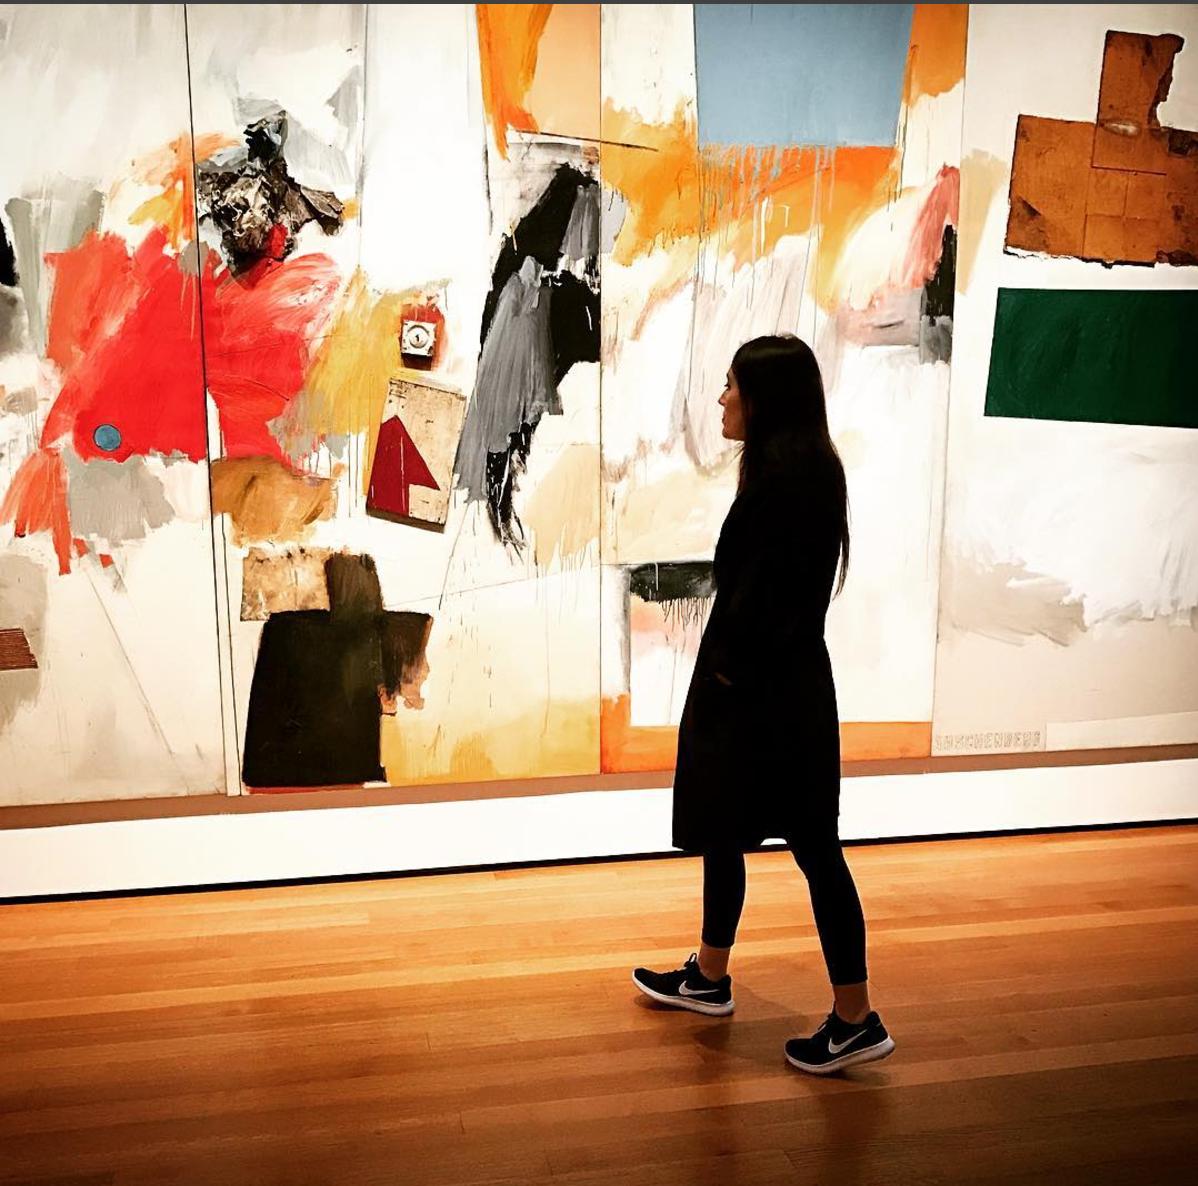 Me at MOMA in New York last week.